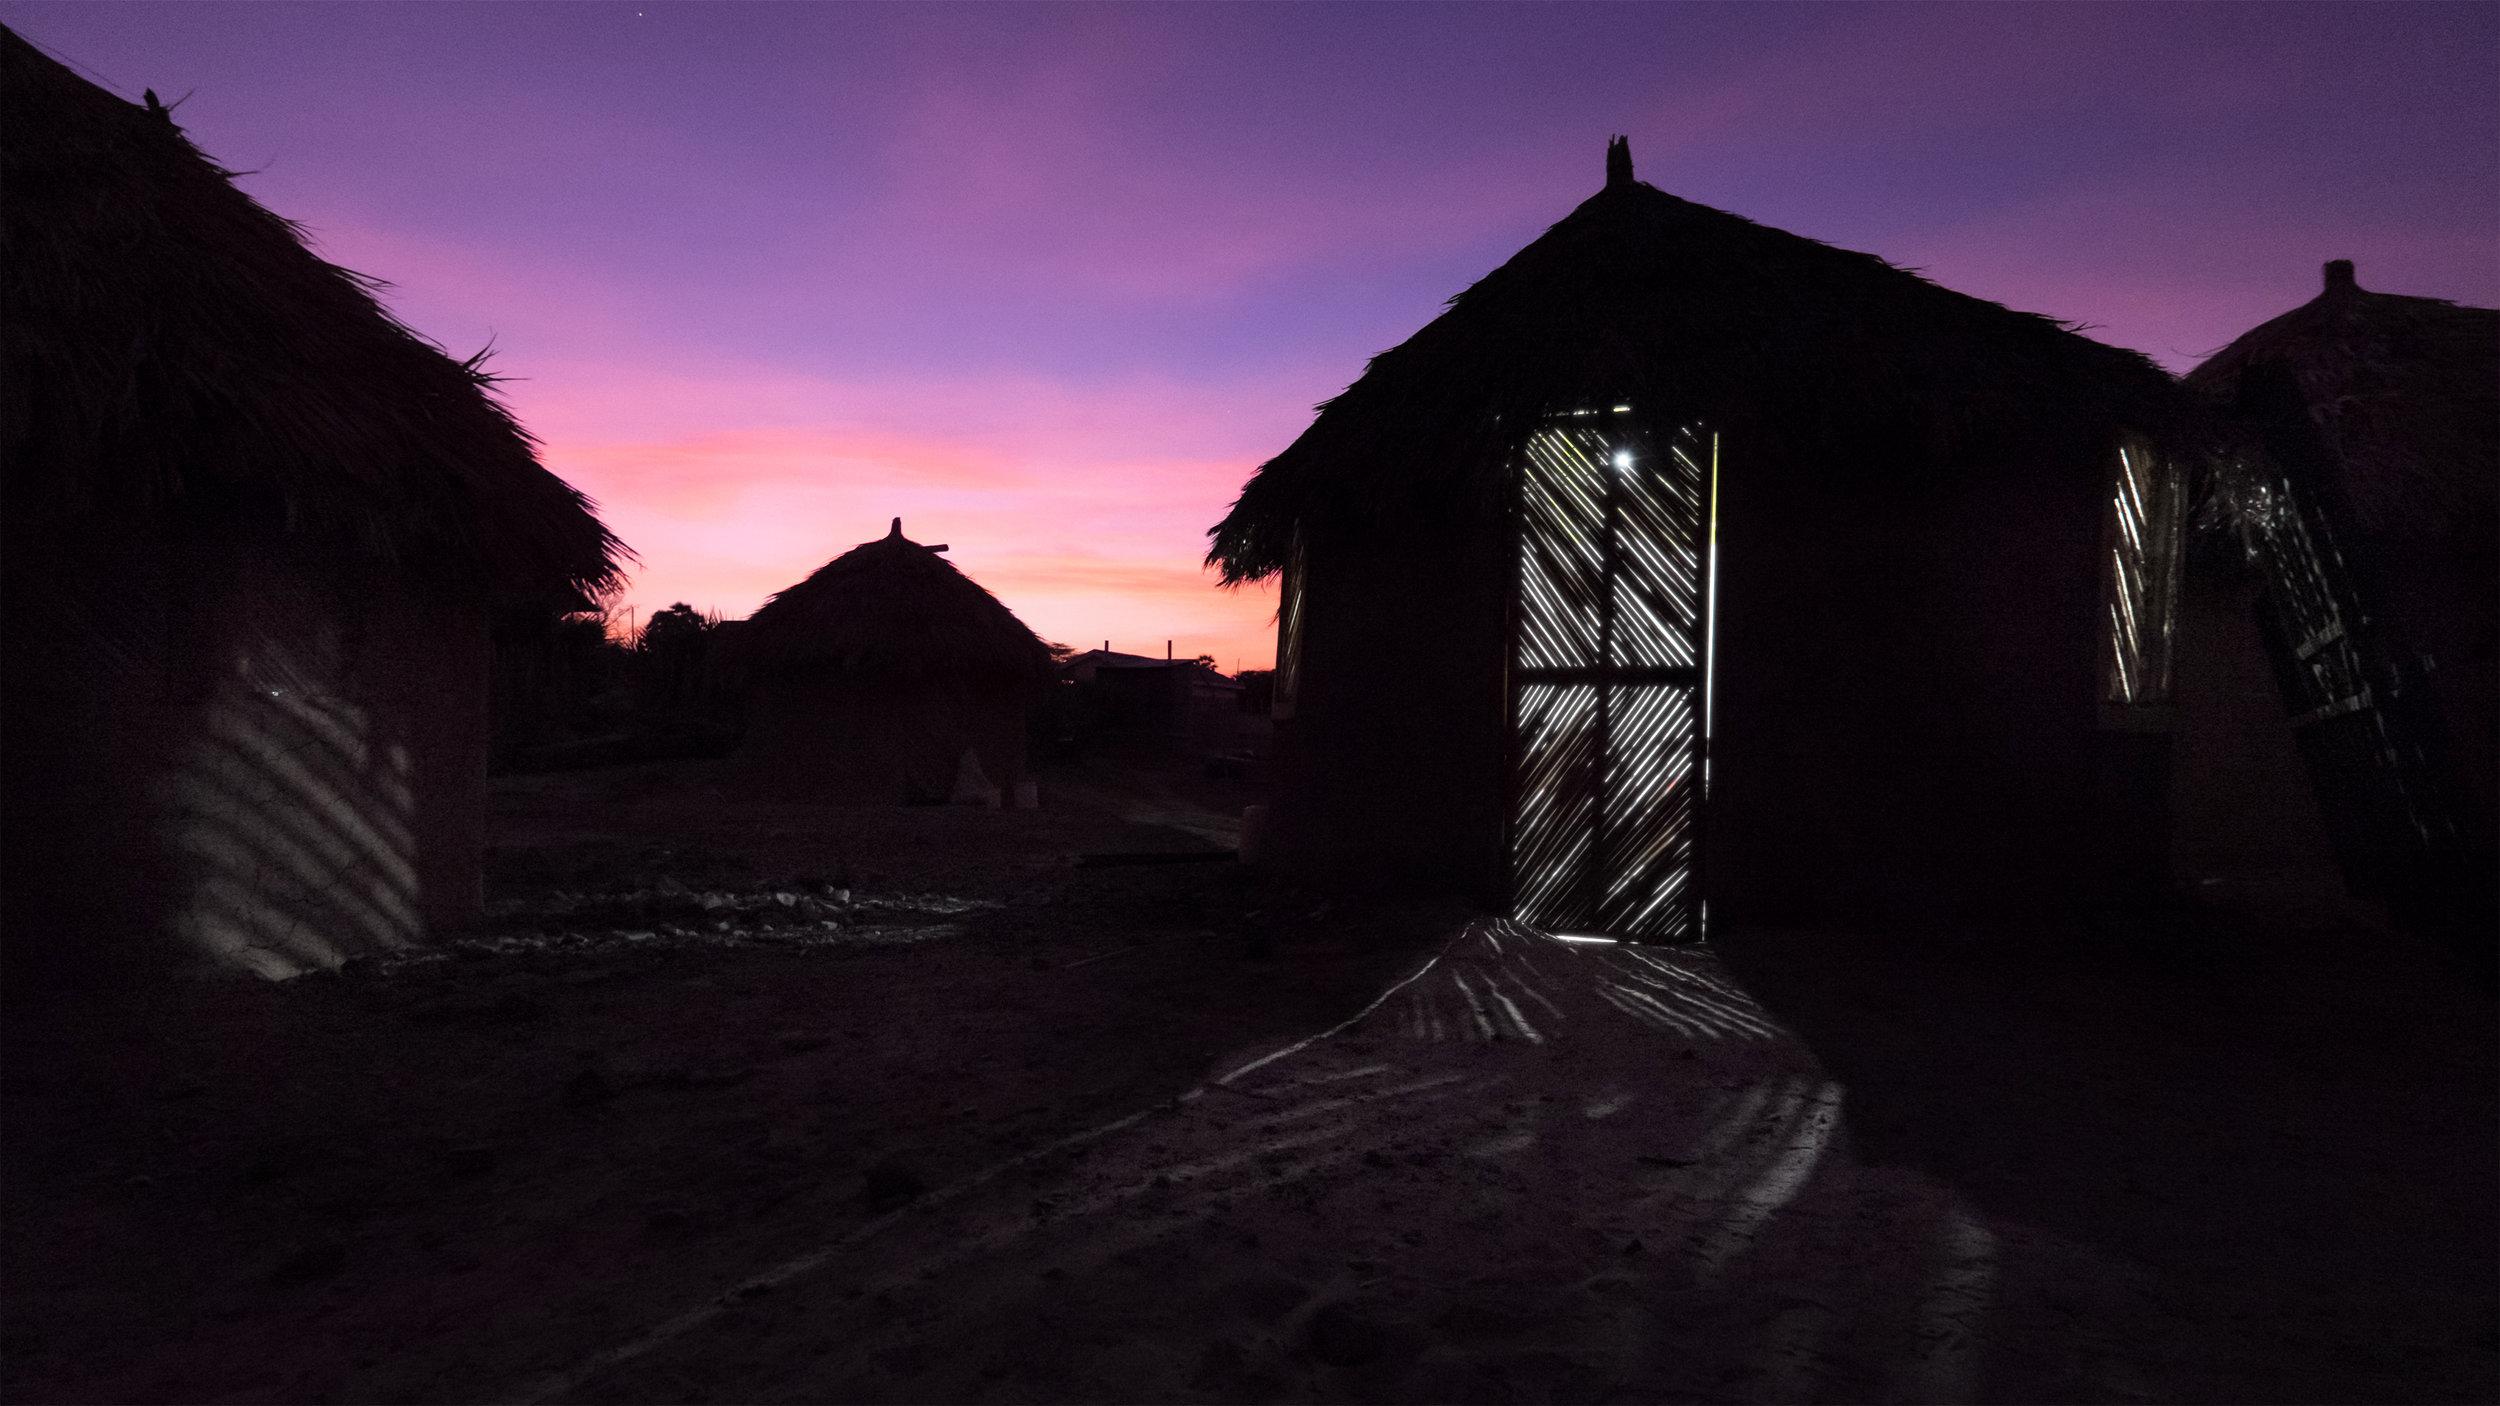 Zola electric nightlight